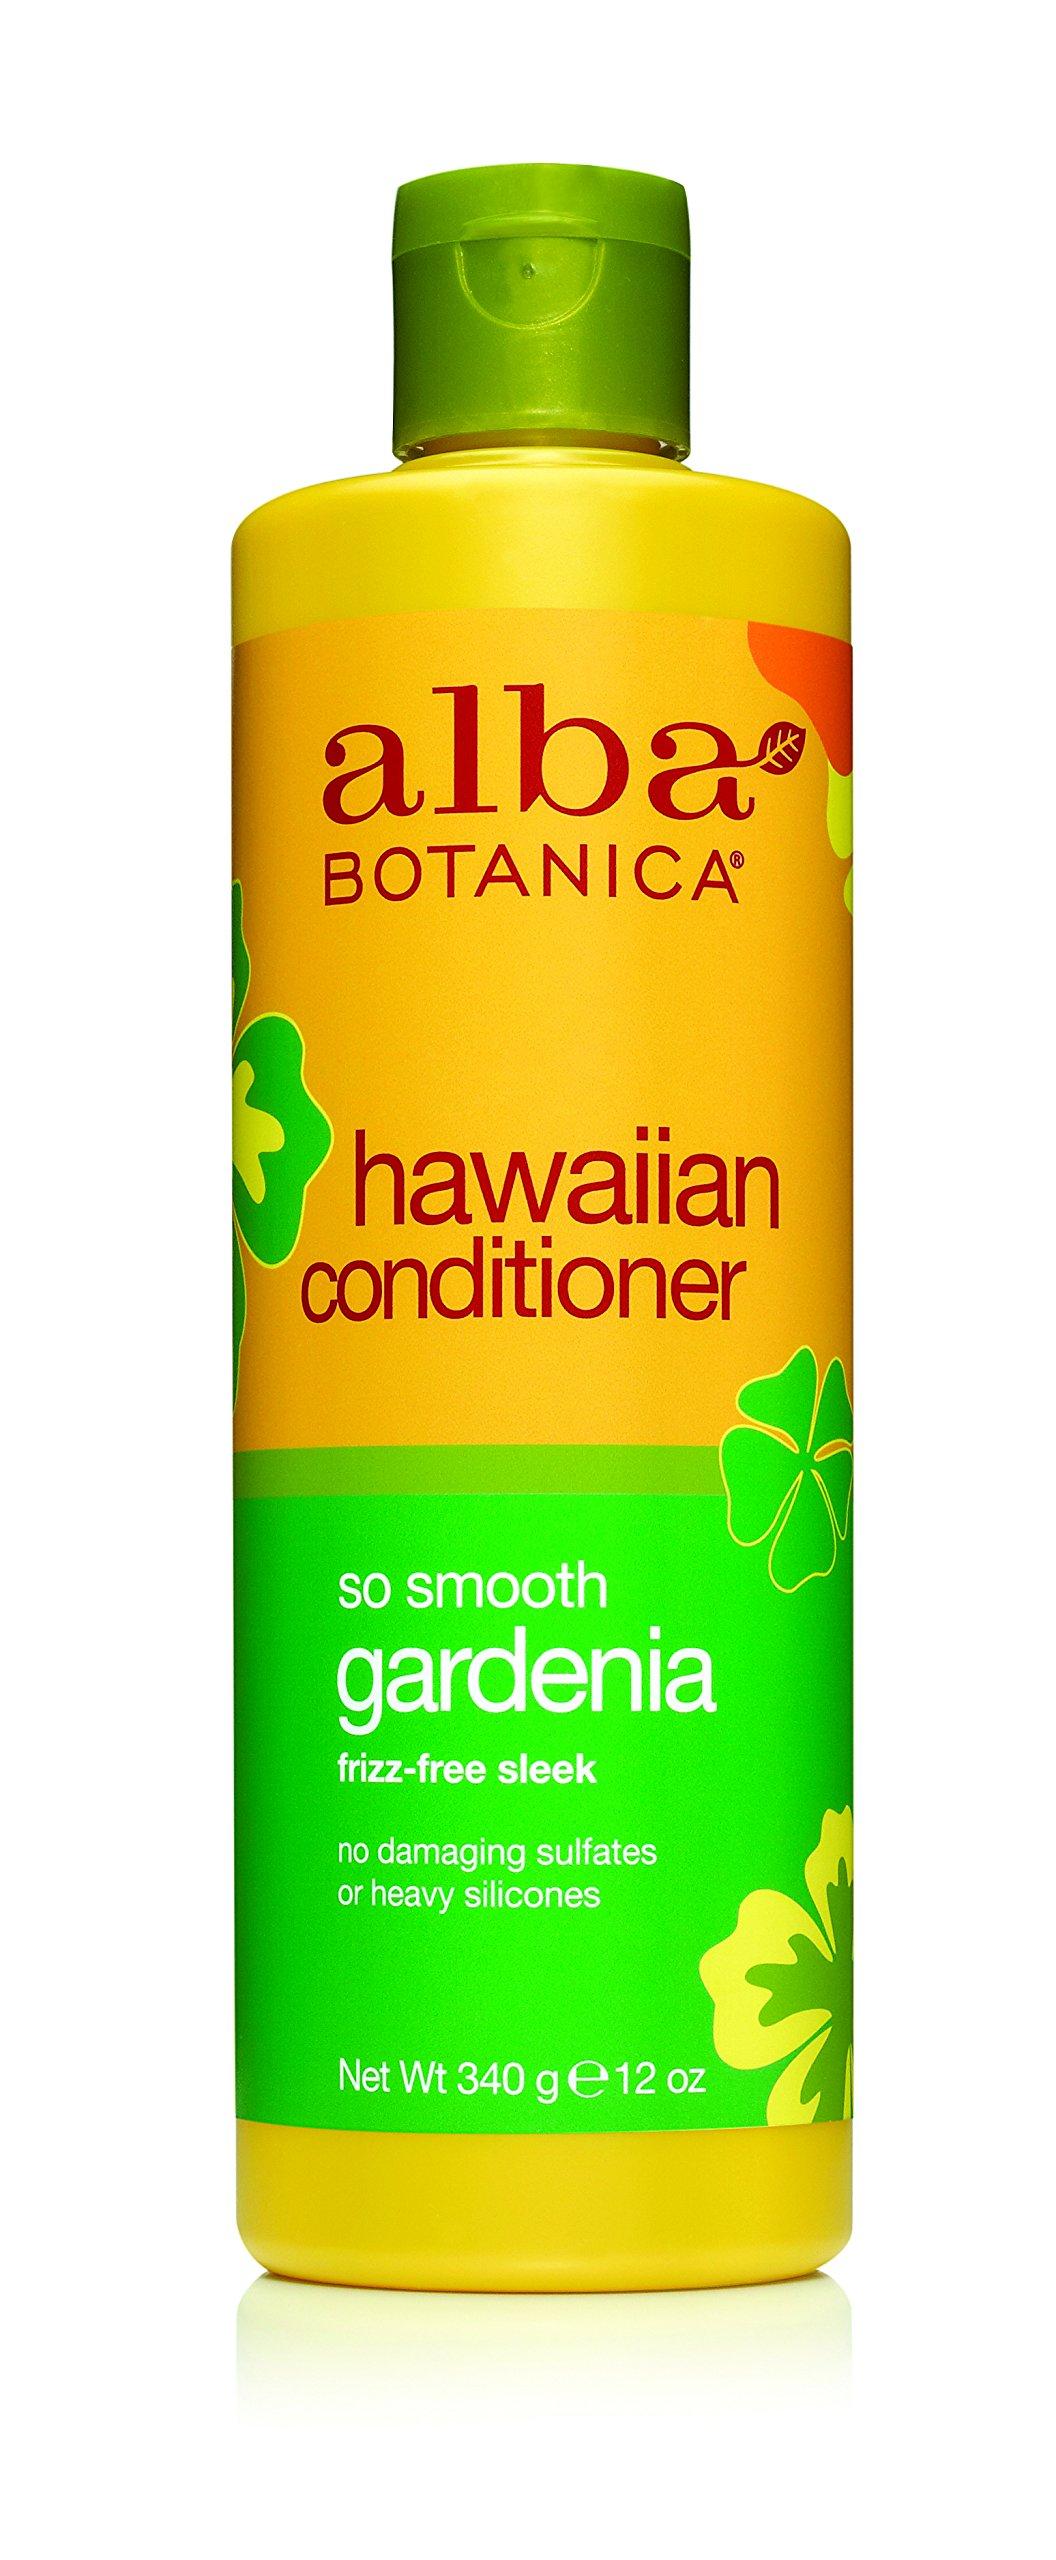 Alba Botanica Hawaiian, Gardenia Conditioner, 12 Ounce